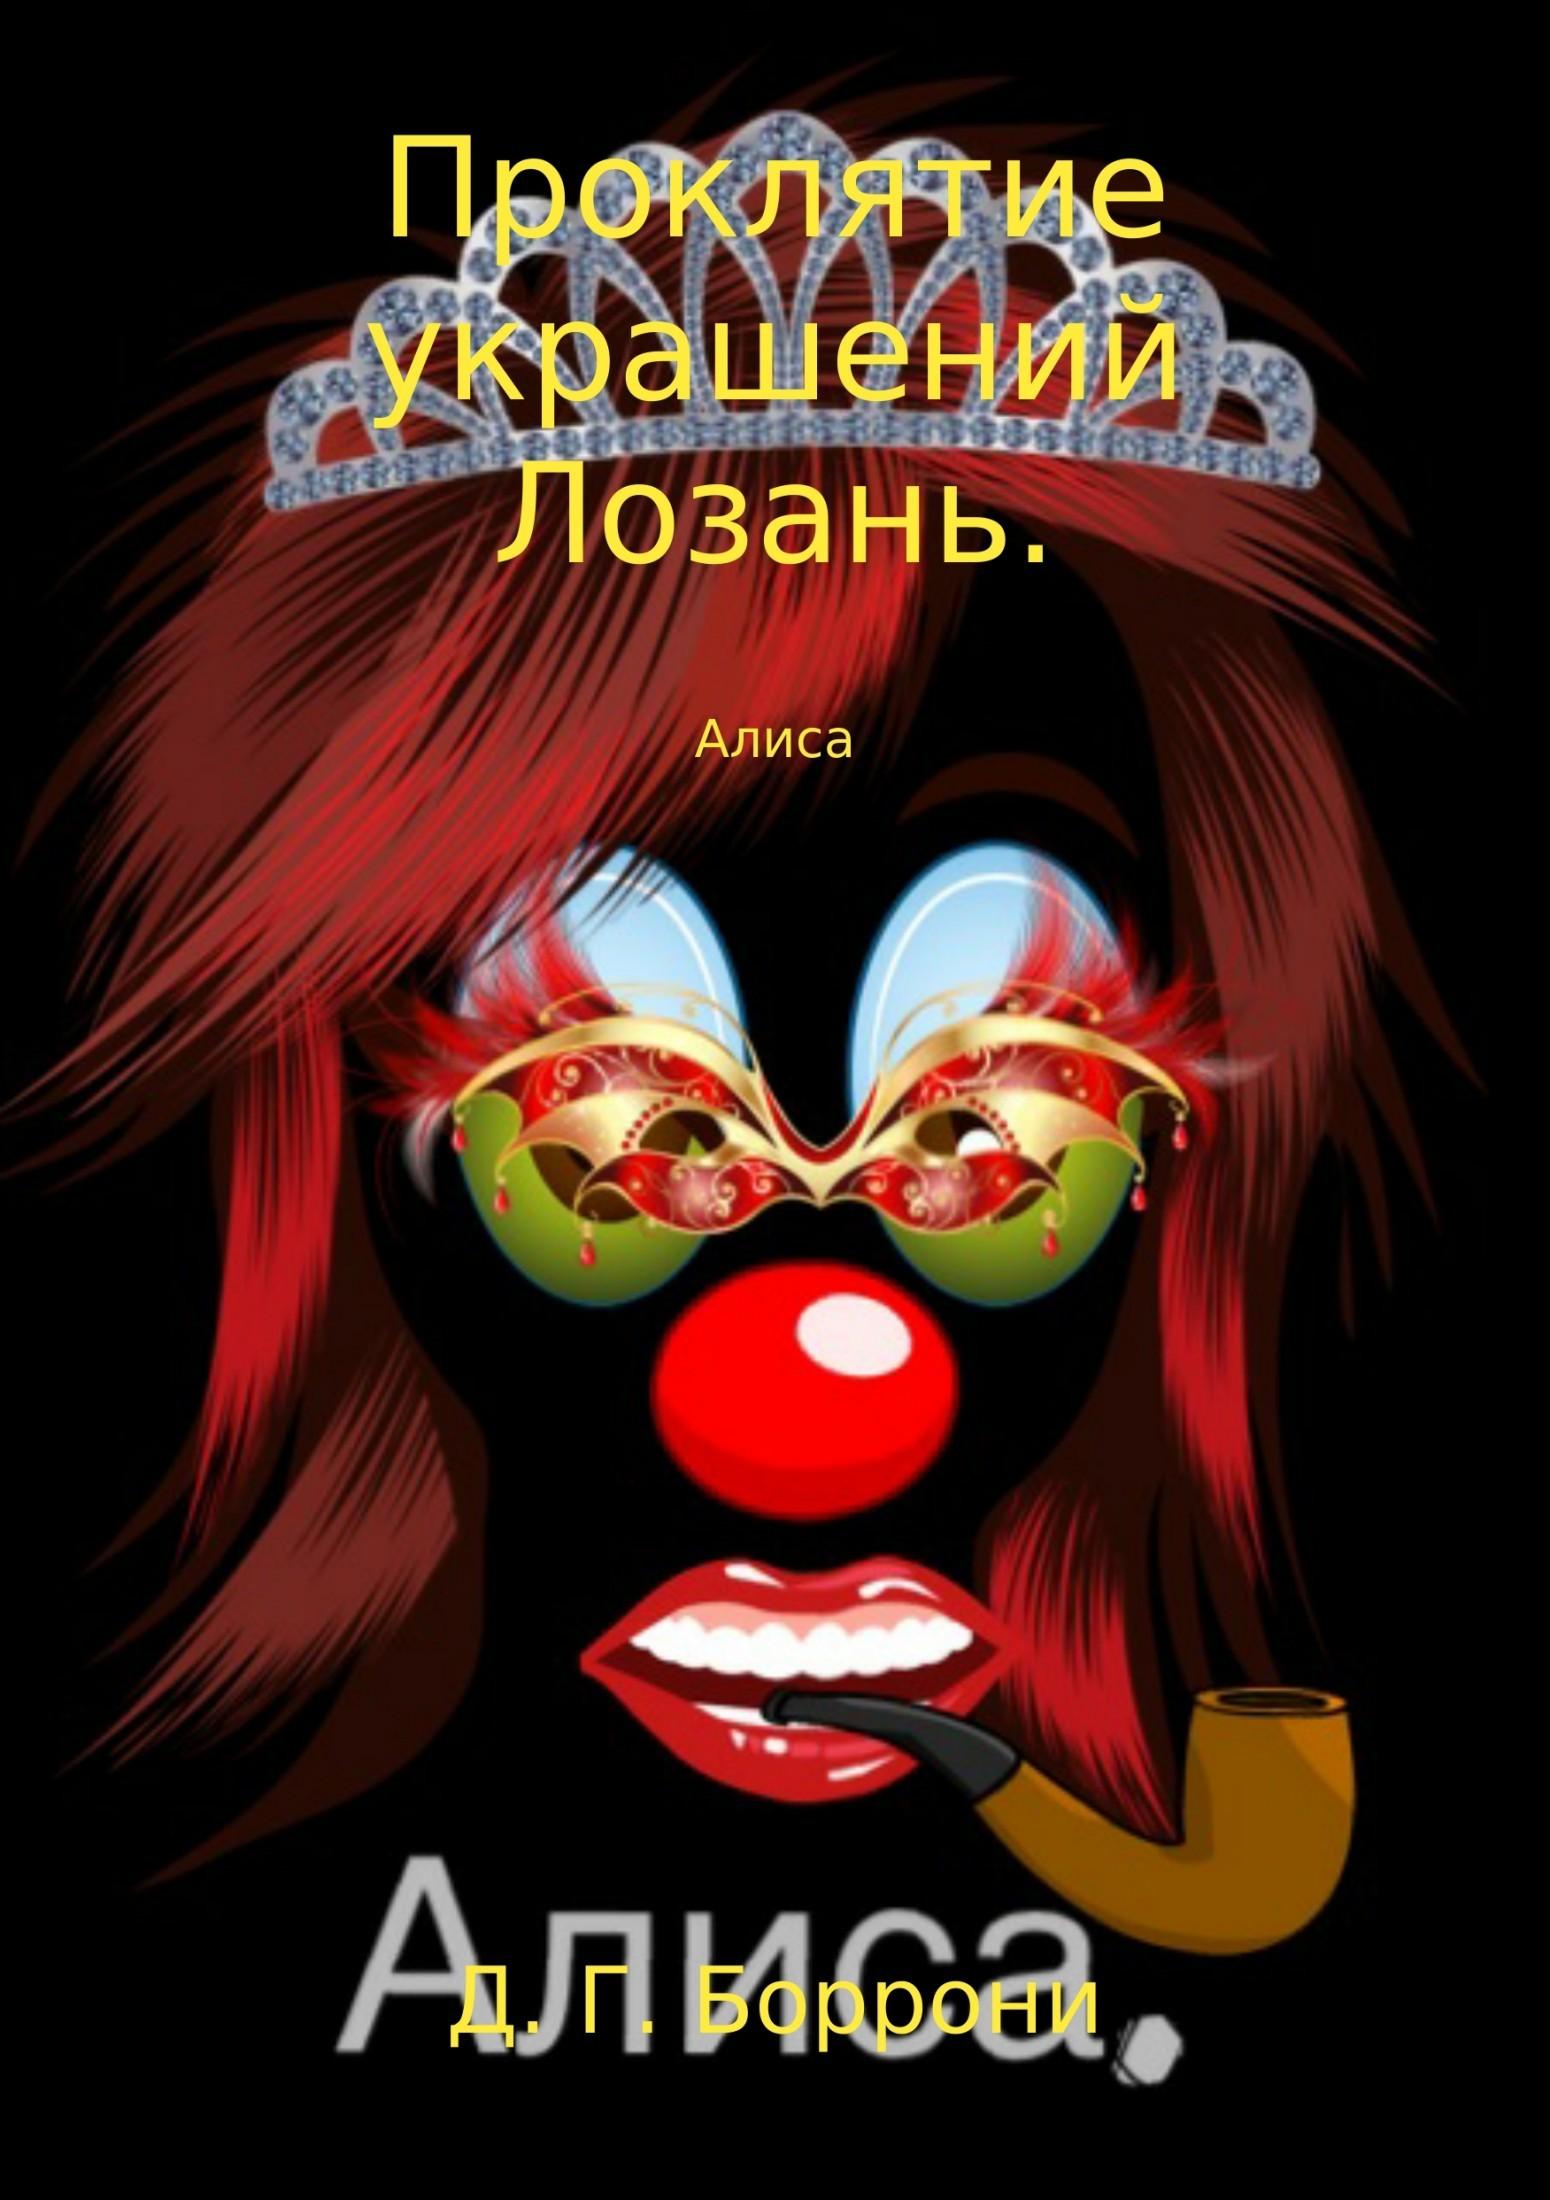 Дмитрий Боррони - Проклятие украшений Лозань: Алиса